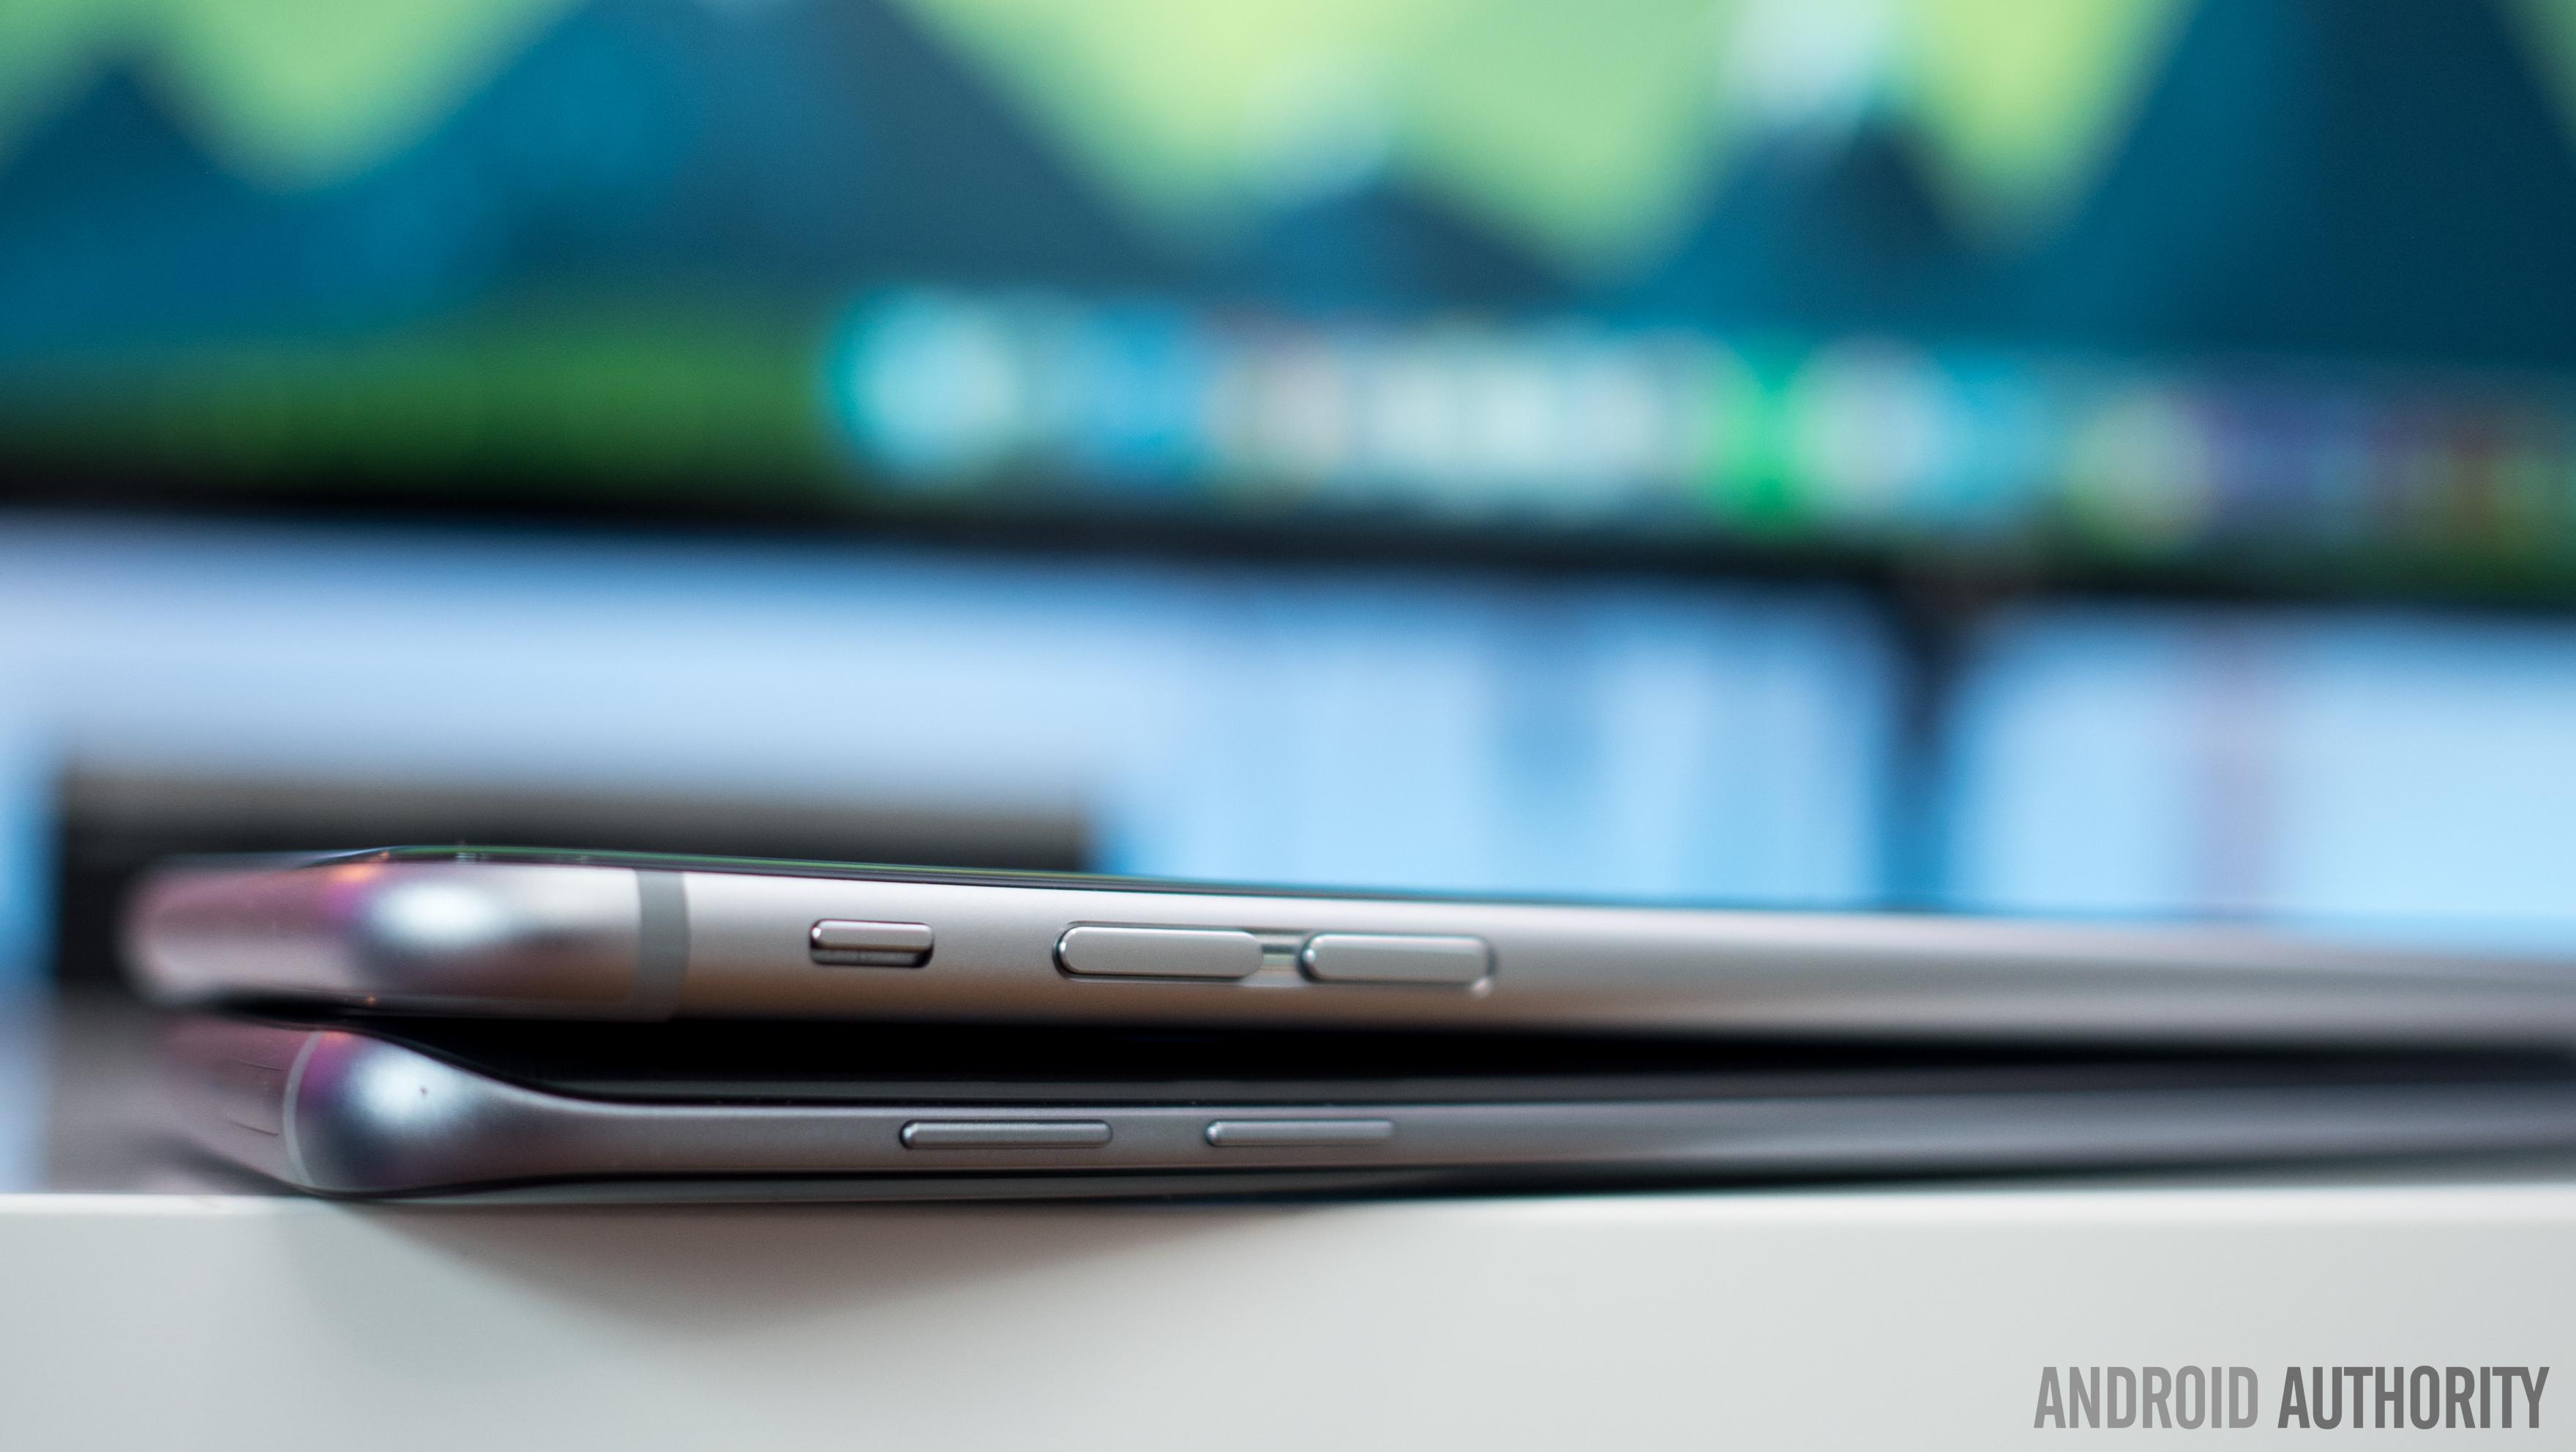 Galaxy-S7-Edge-vs-iPhone-6s-plus-4of18